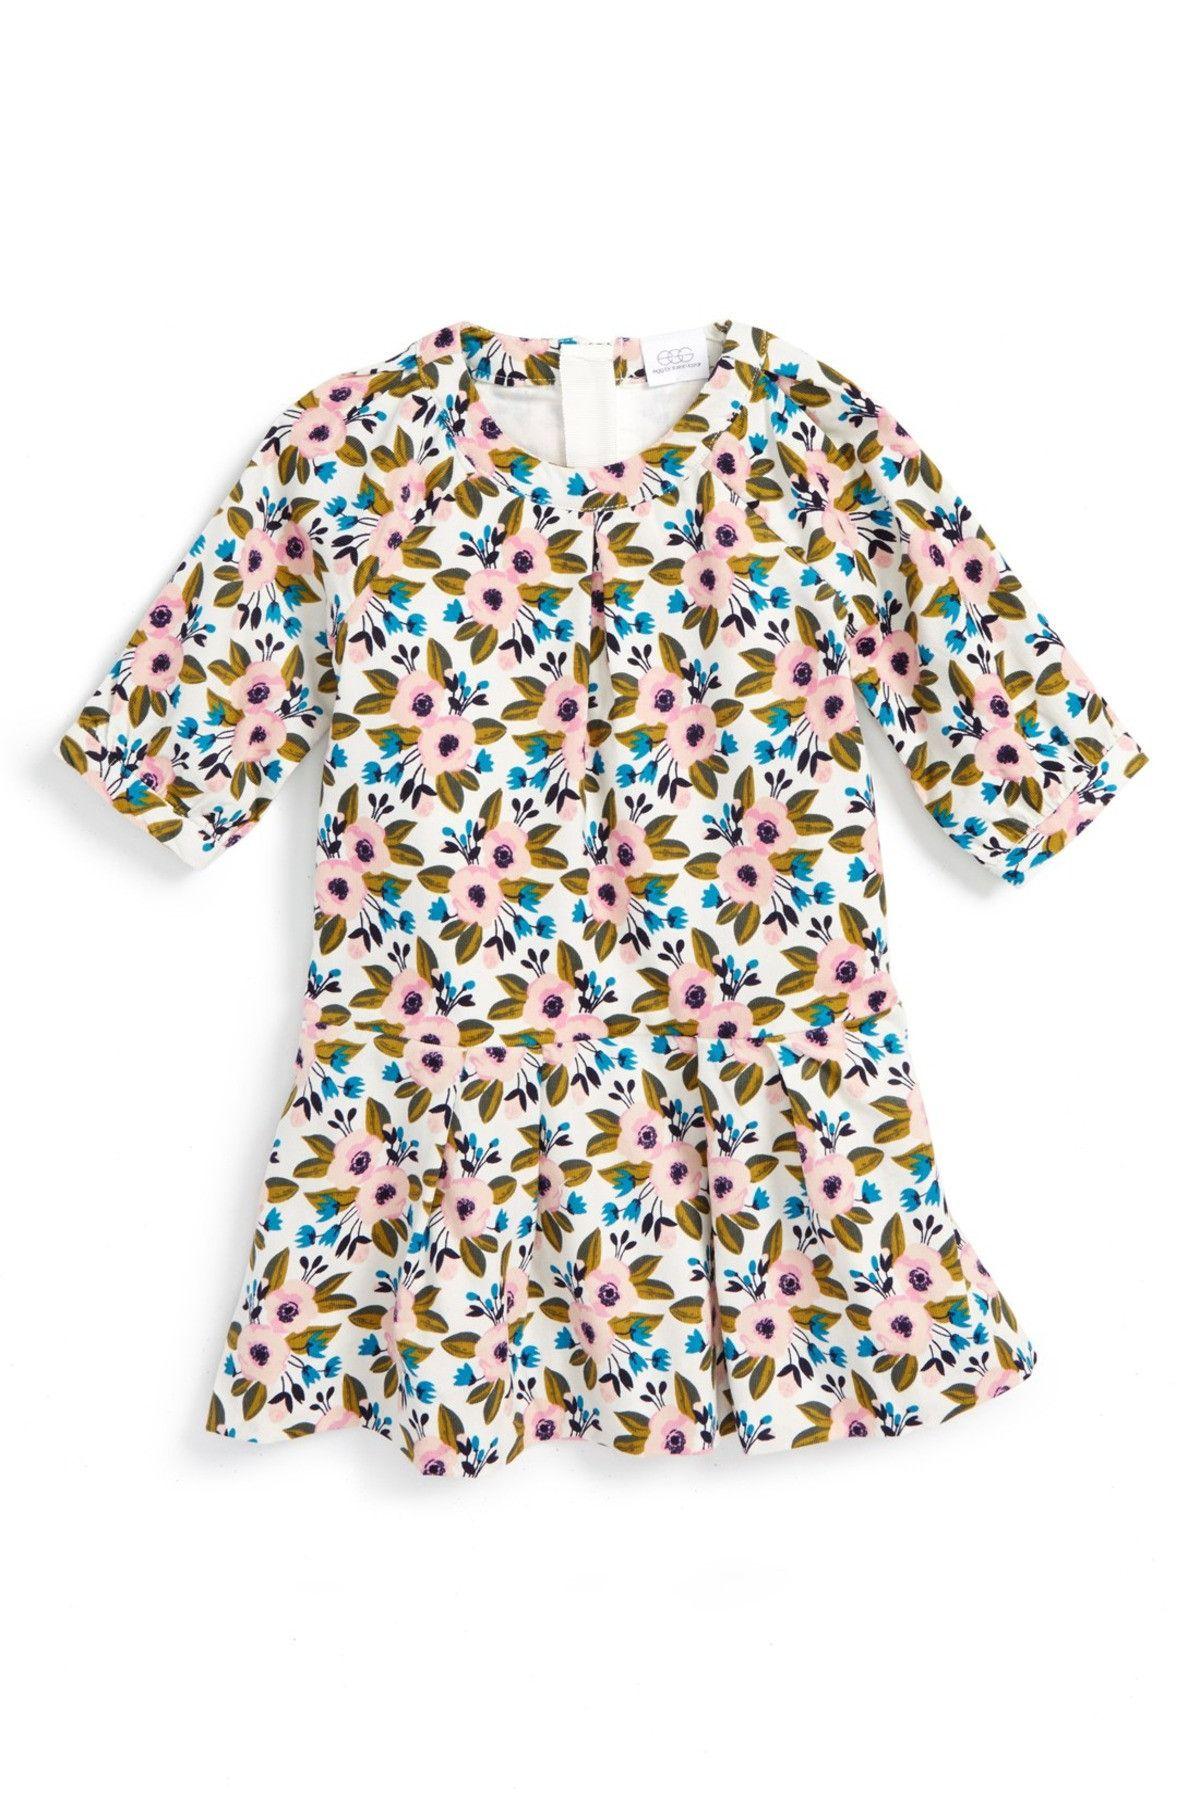 Floral Print Corduroy Dress Baby Girls